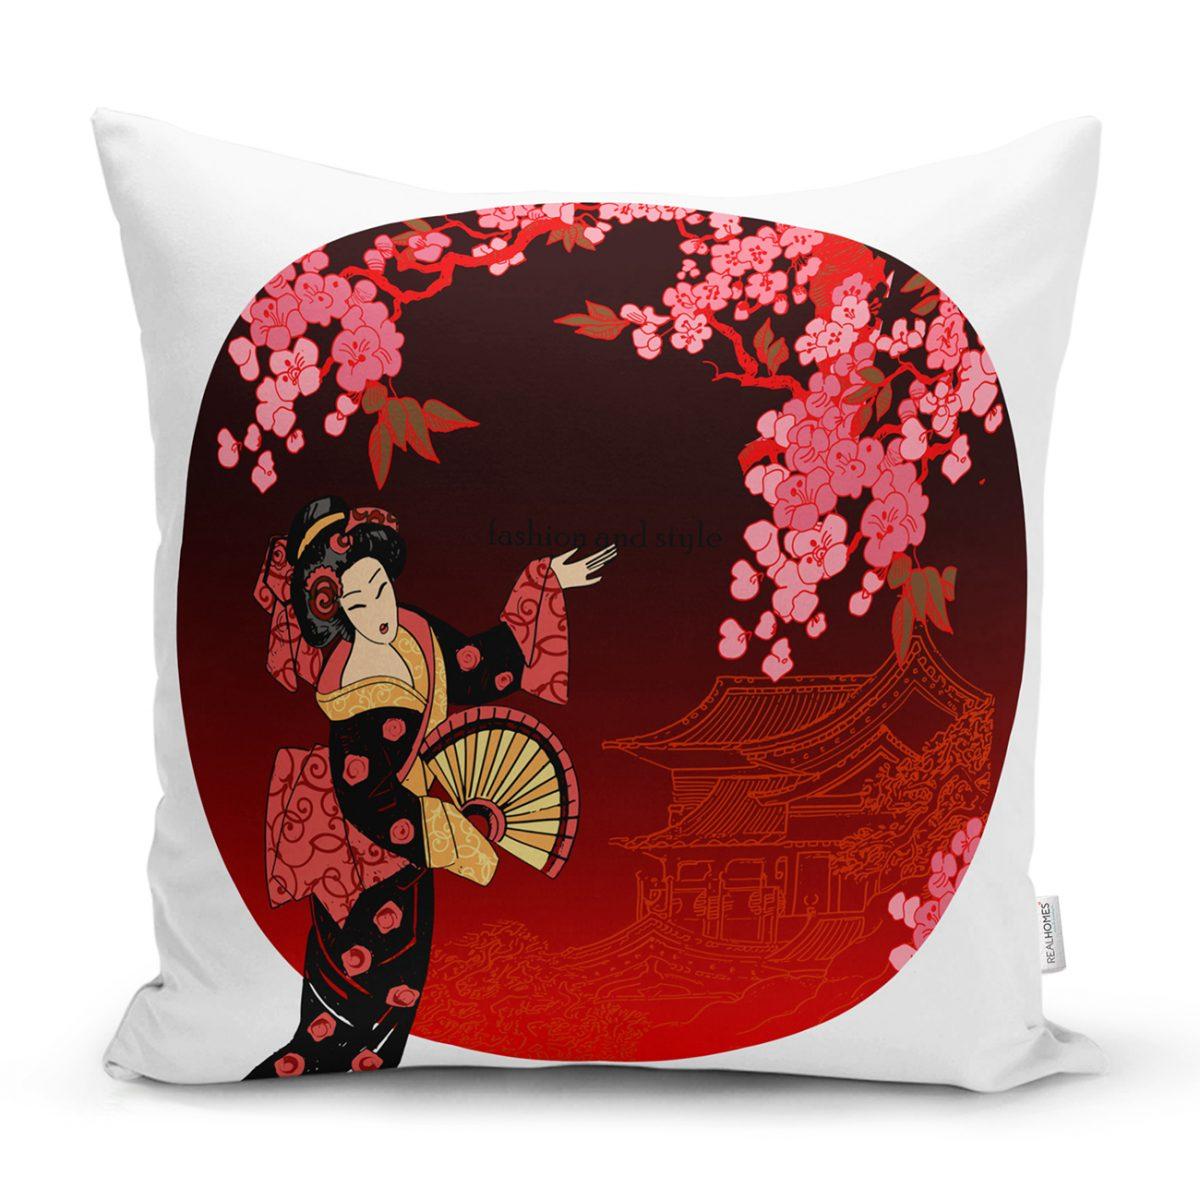 Çiçek Desenli Yelpazeli Japon Kız Motifli Modern Kırlent Kılıfı Realhomes